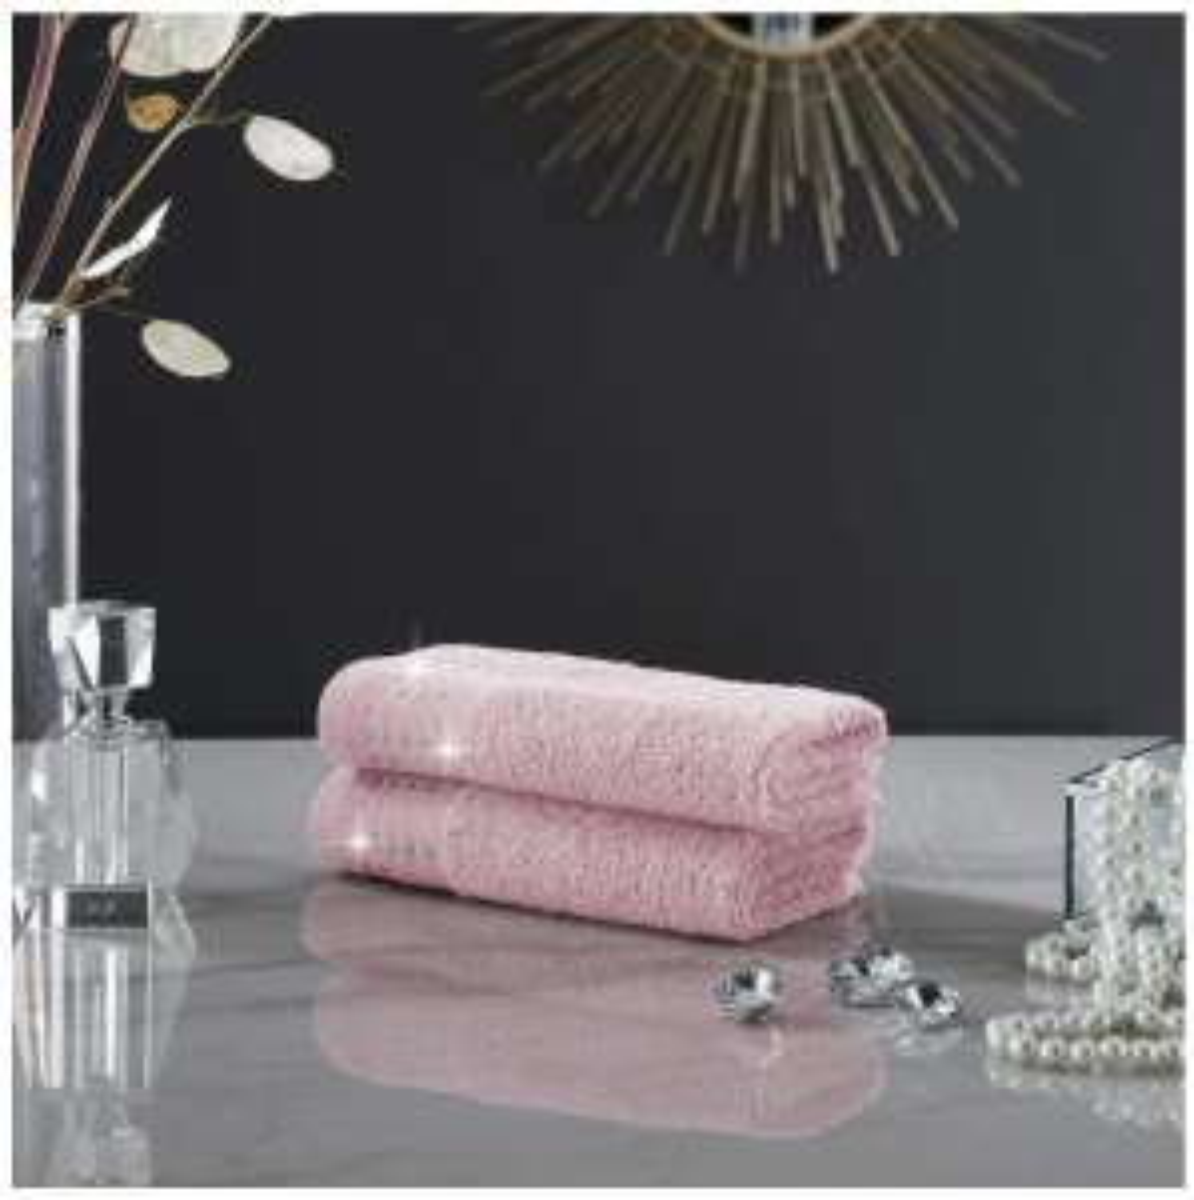 GAVENO CAVAILIA Luxury 2PK Abington Towel Set, 100% Cotton Soft Blush Pink, Face towels £1.31 Amazon Prime (+£4.49 Non Prime)